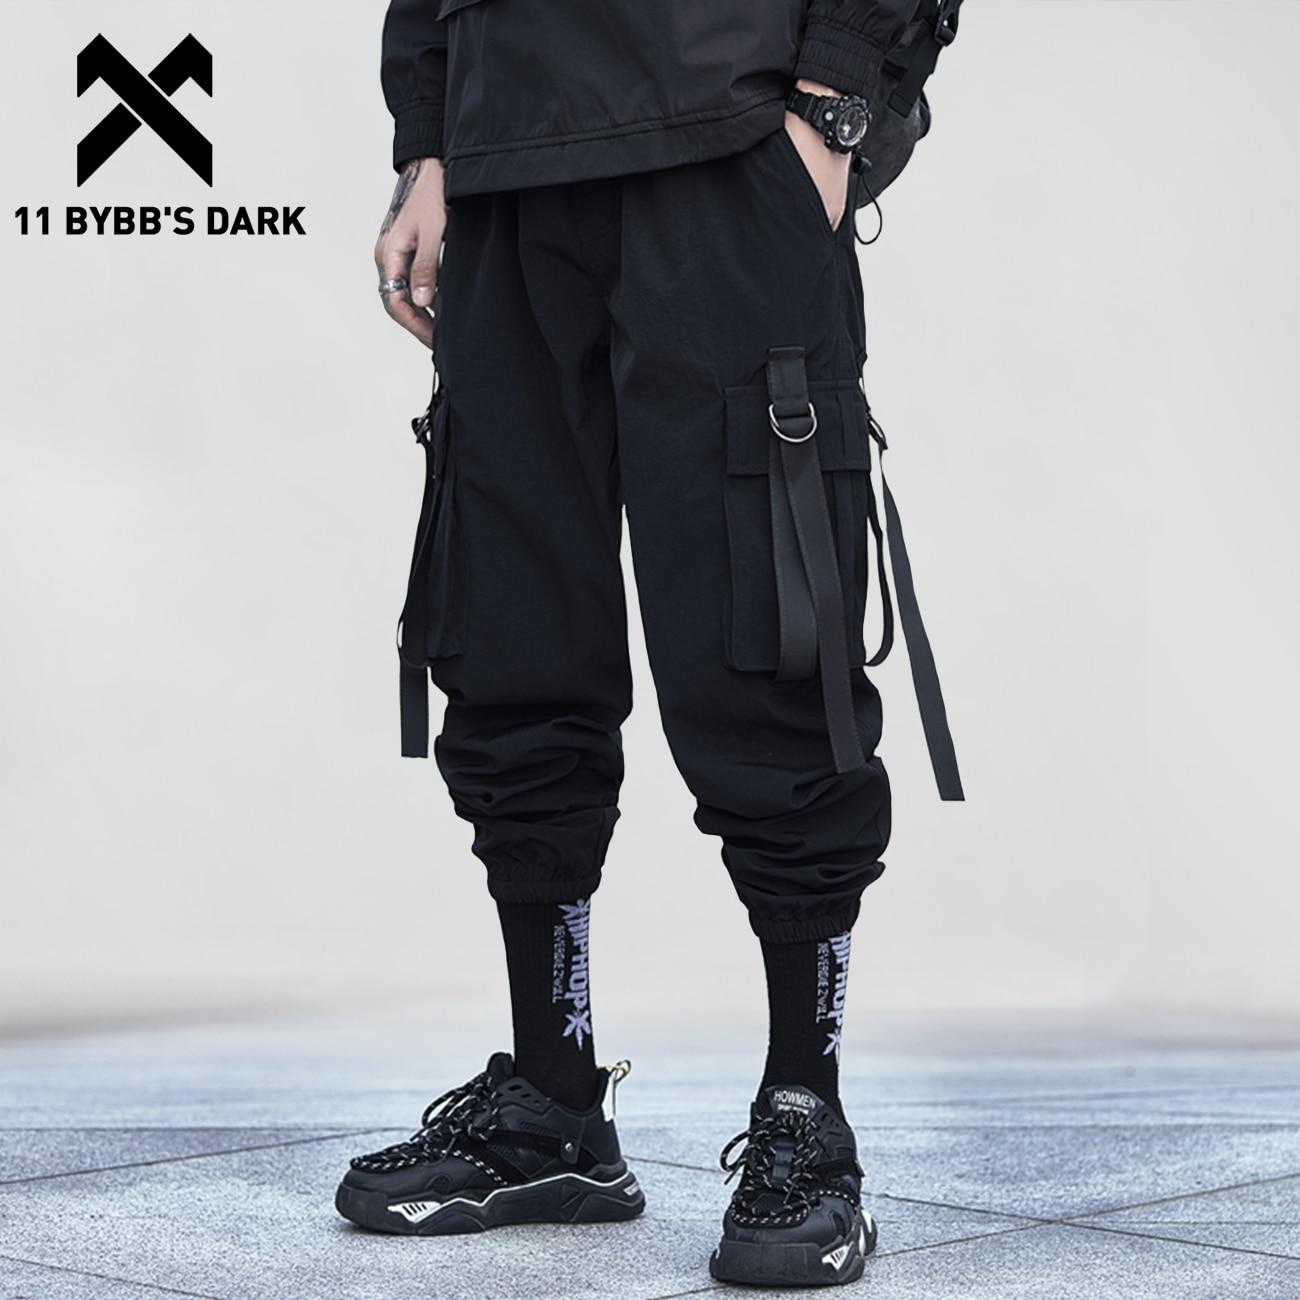 11 BYBB'S DARK Hip Hop Tactical Pants Men 2020 Elastic Waist Ribbon Harem Sweatpants Streetwear Oversize Casual Joggers Trousers